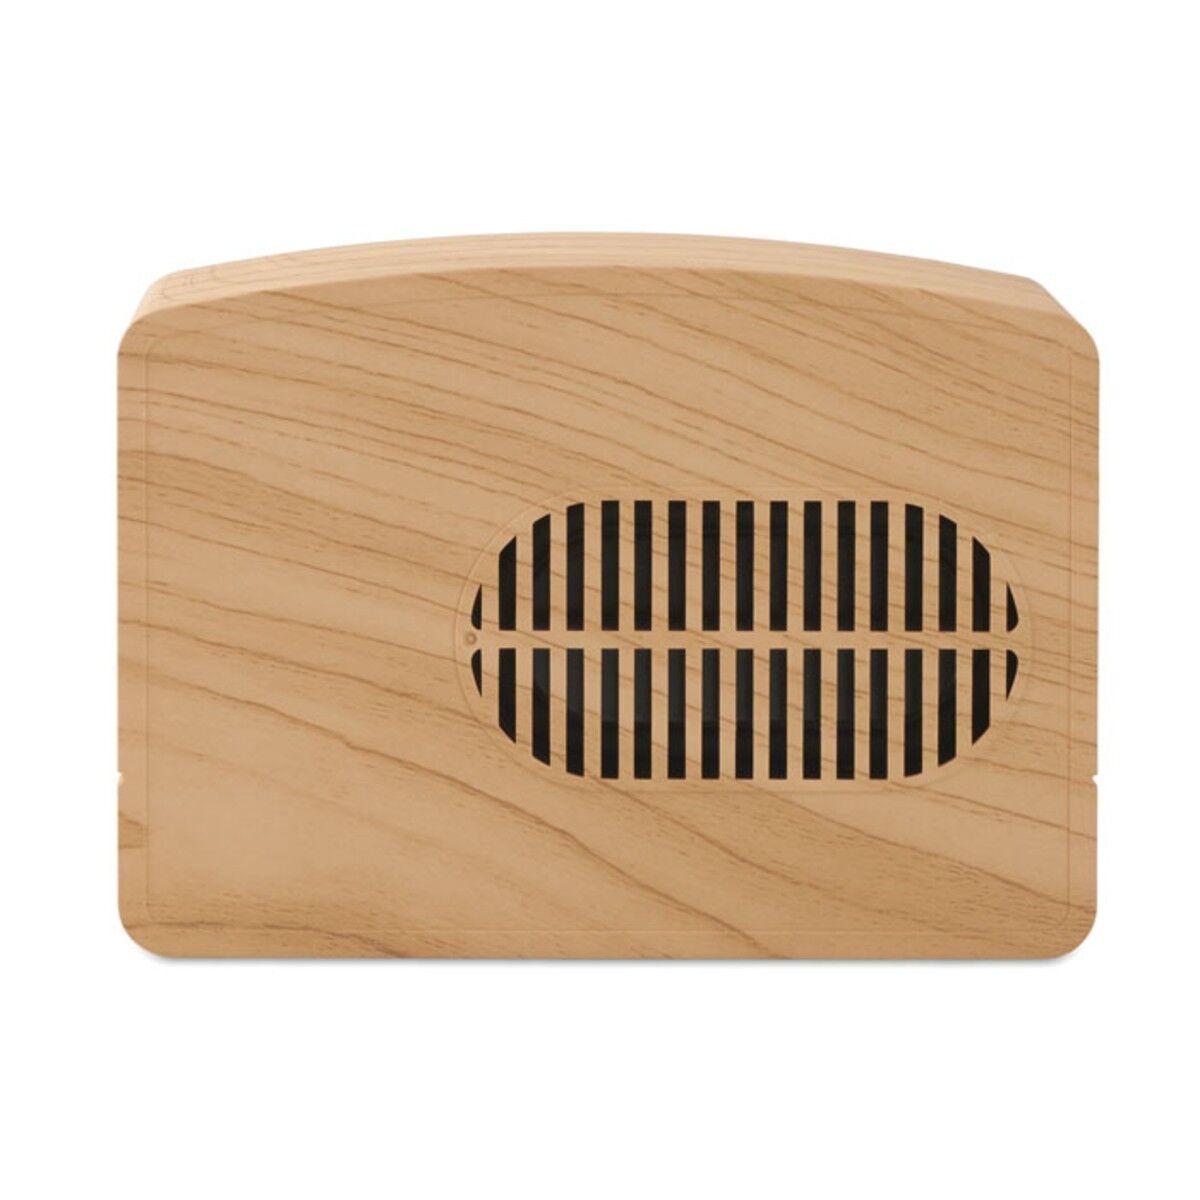 Retro Bluetooth Speaker back view